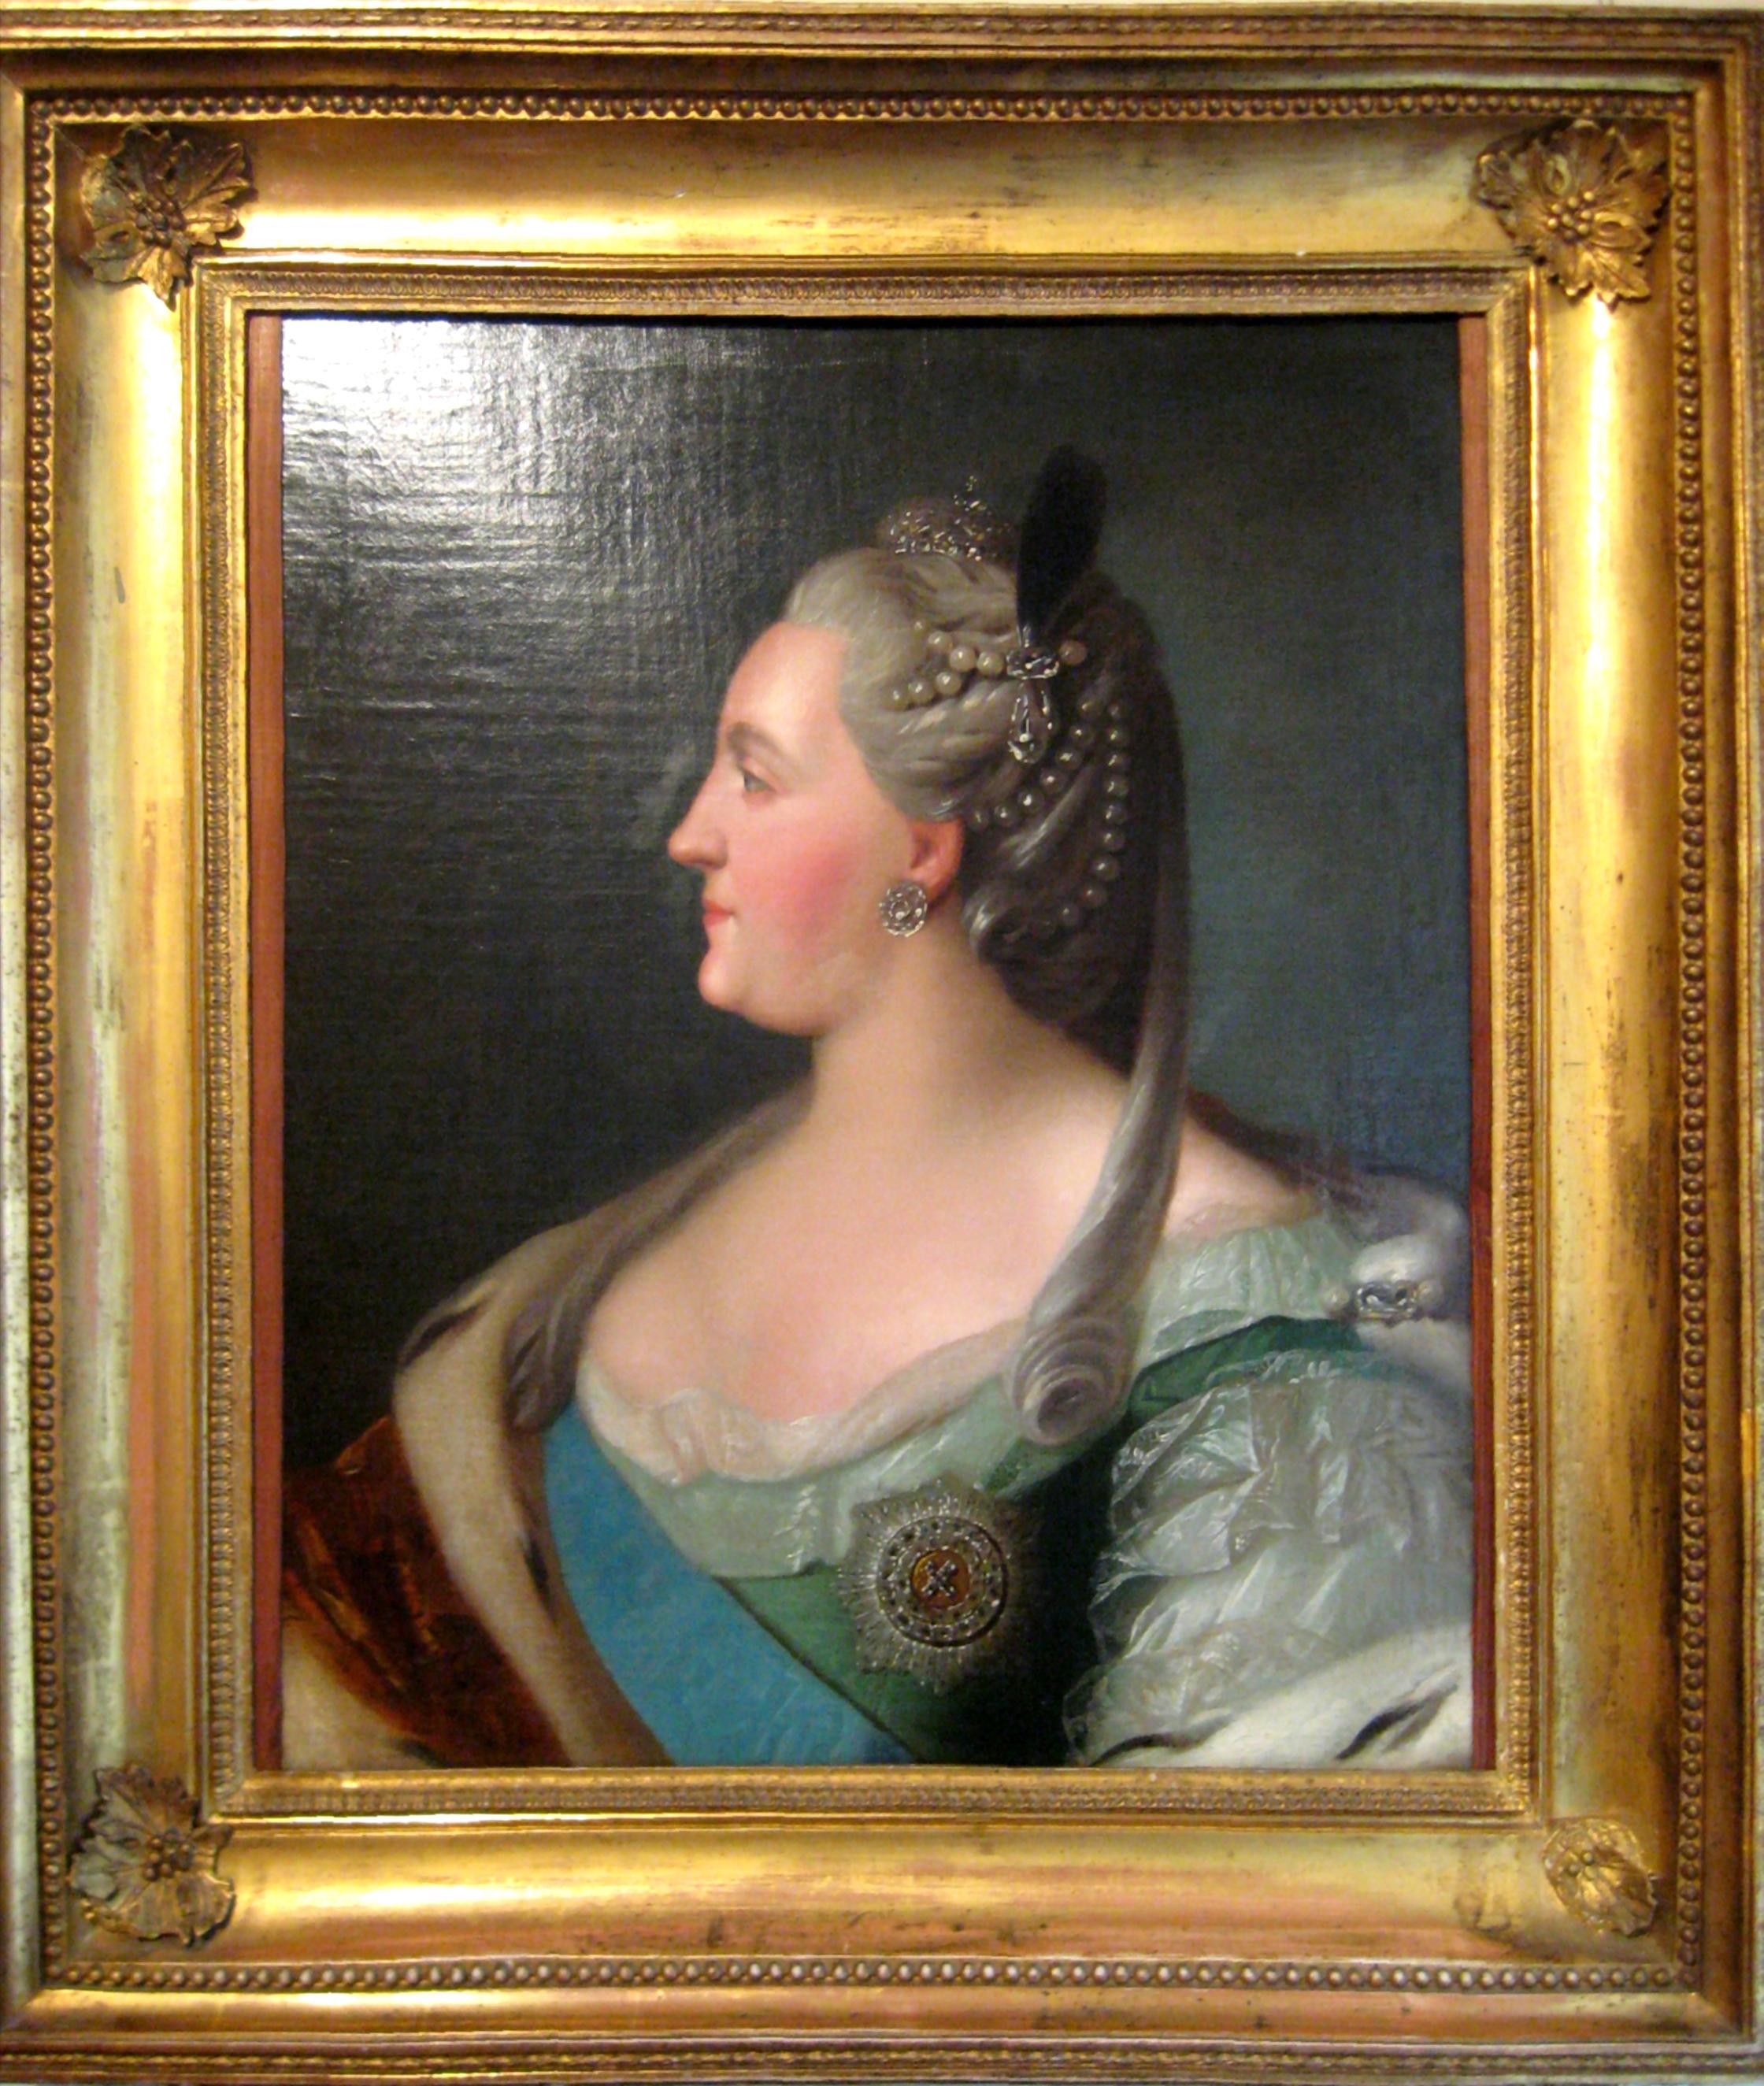 filecatherine ii profile portrait tropinin museum framejpg - Museum Frames